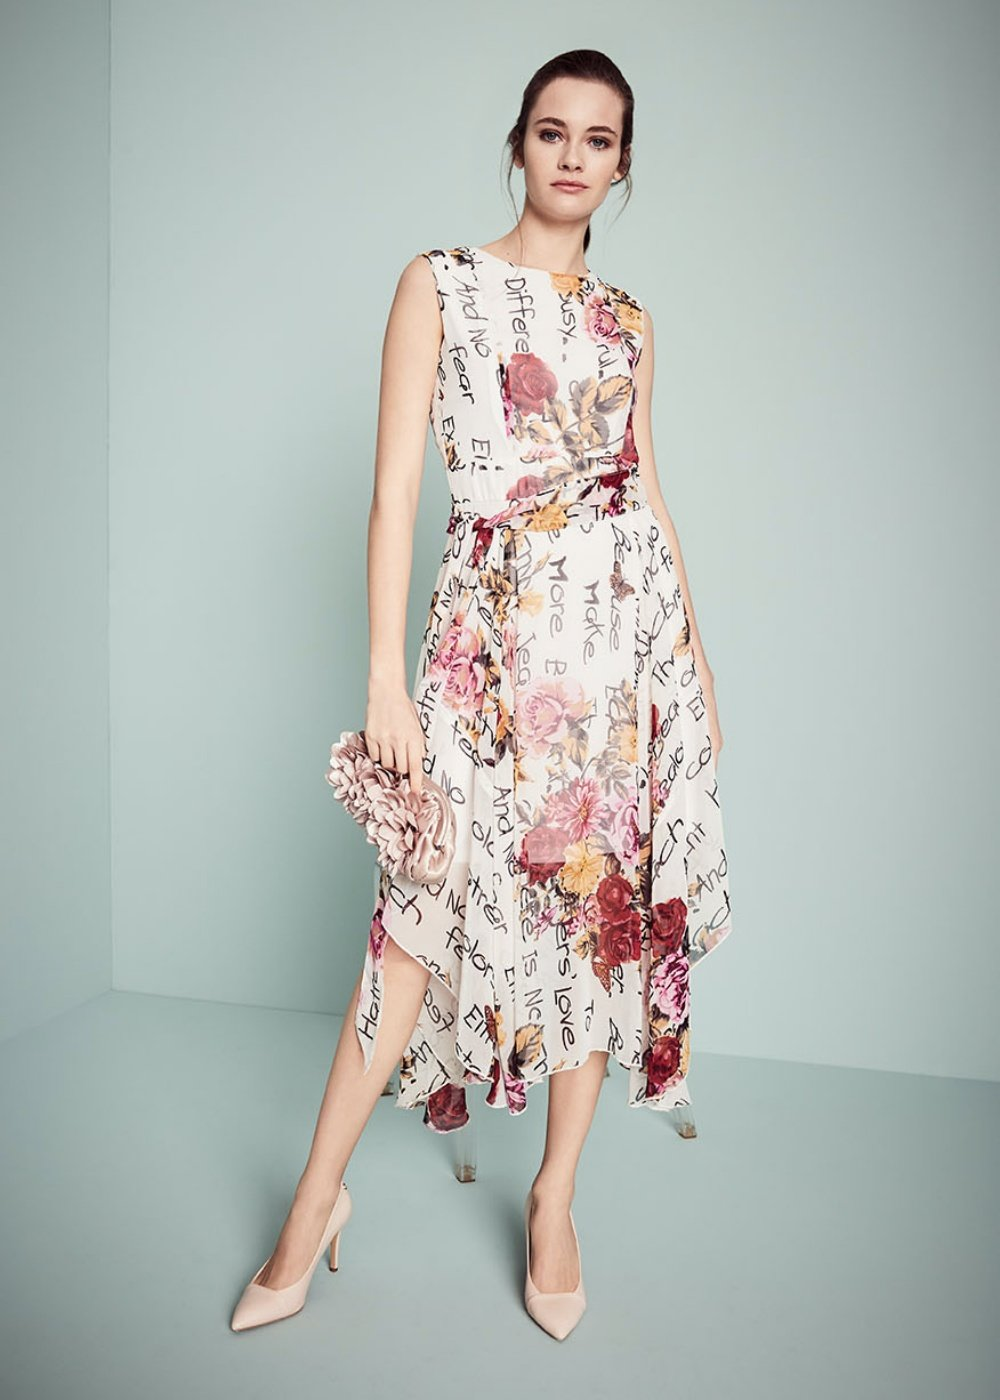 Aramis dress with floral pattern - Black White Fantasia - Woman